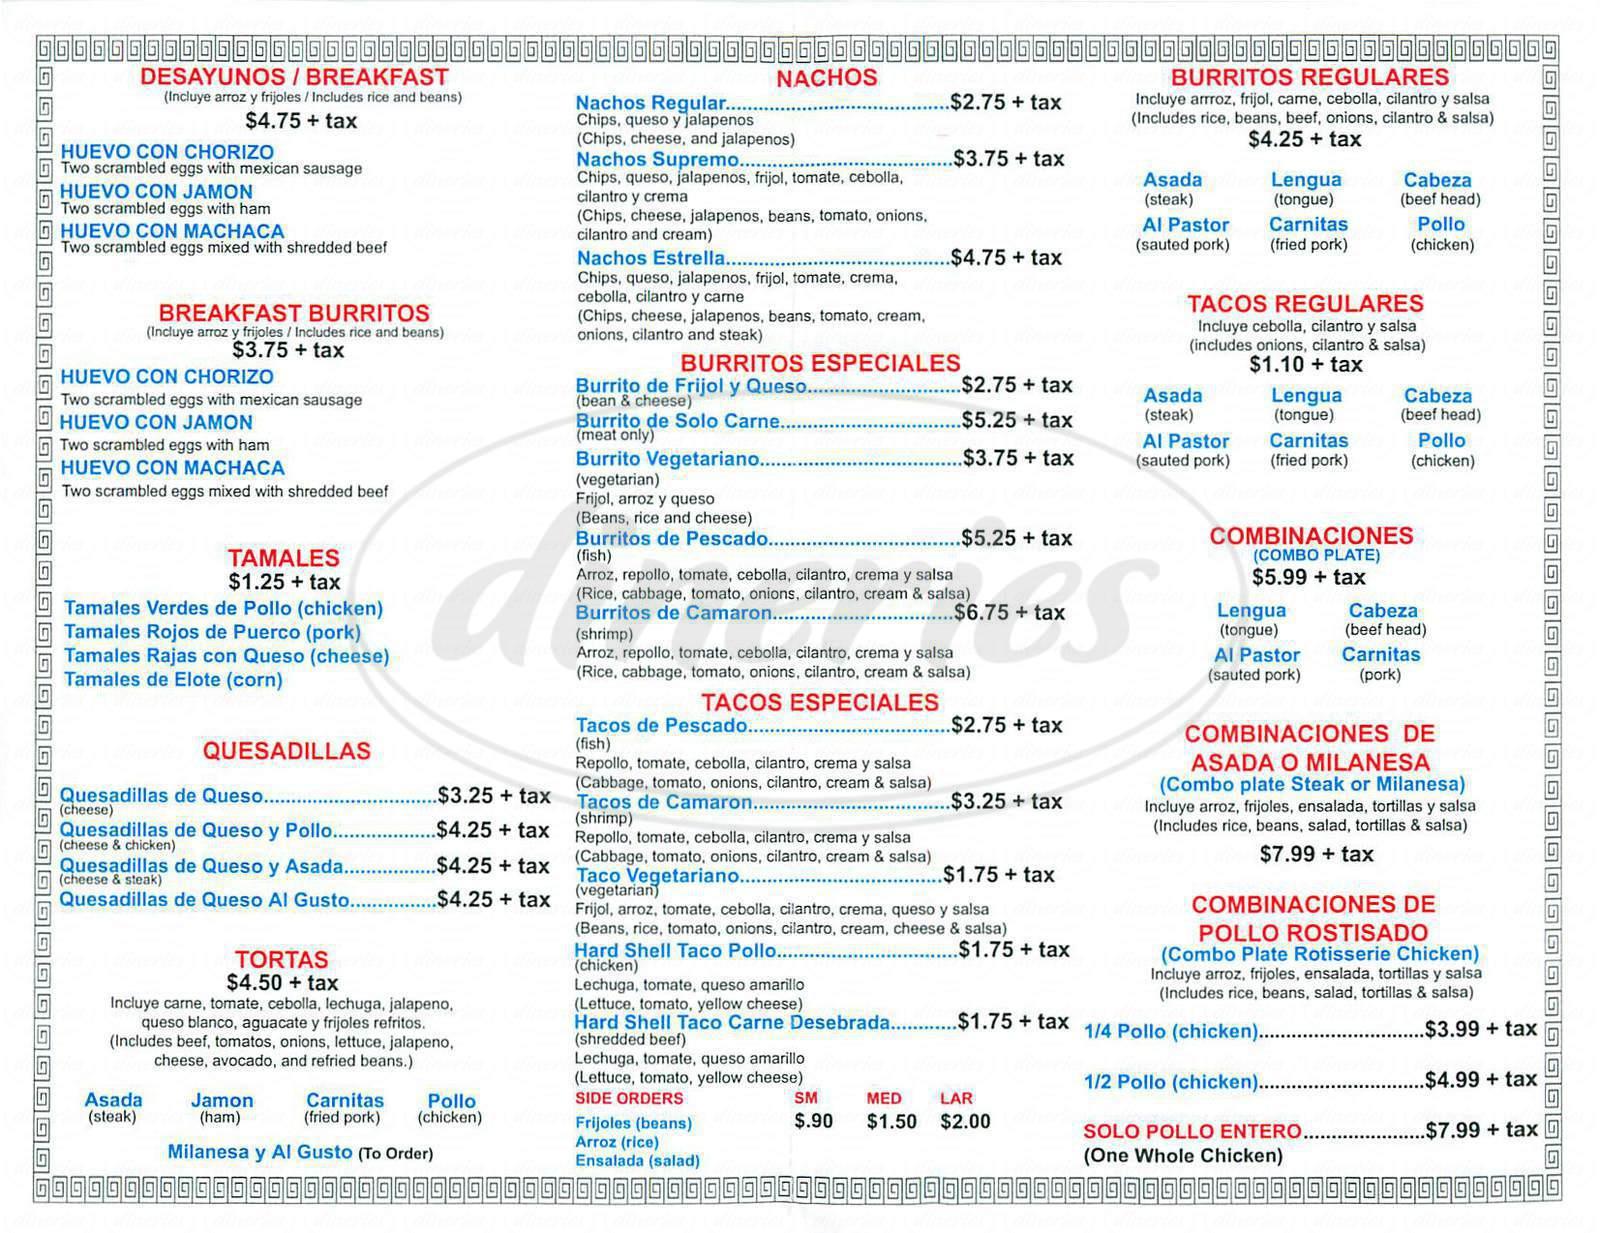 menu for Viva Tacos La Estrella